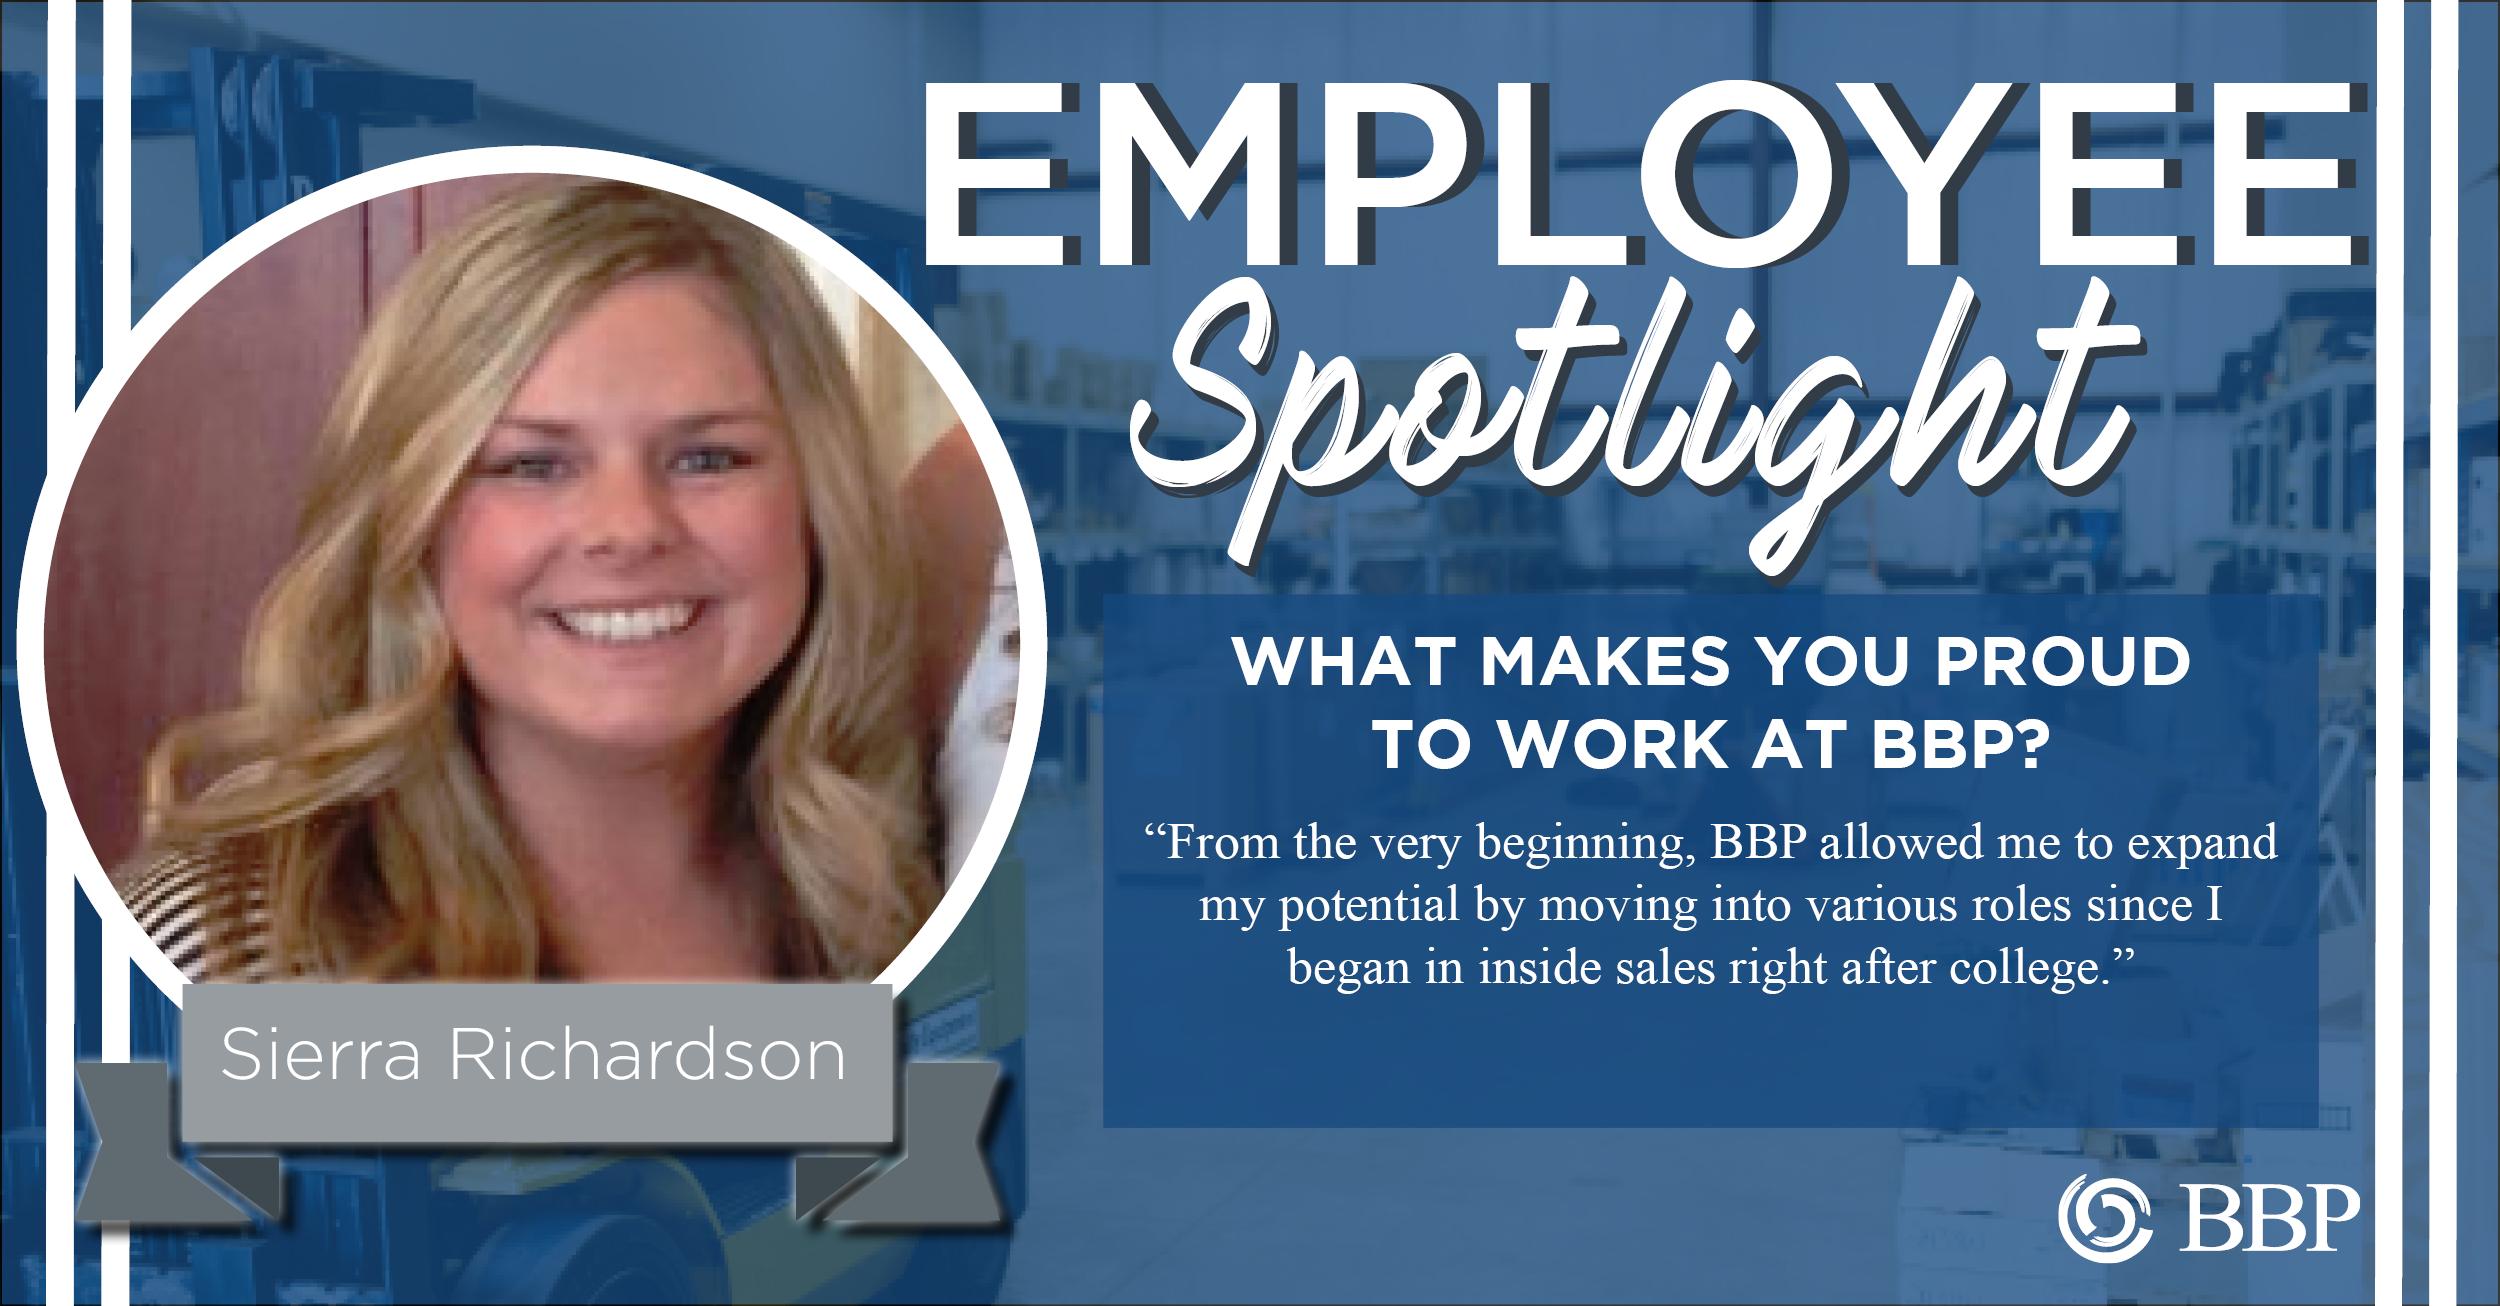 Sierra Richardson Employee Spotlight